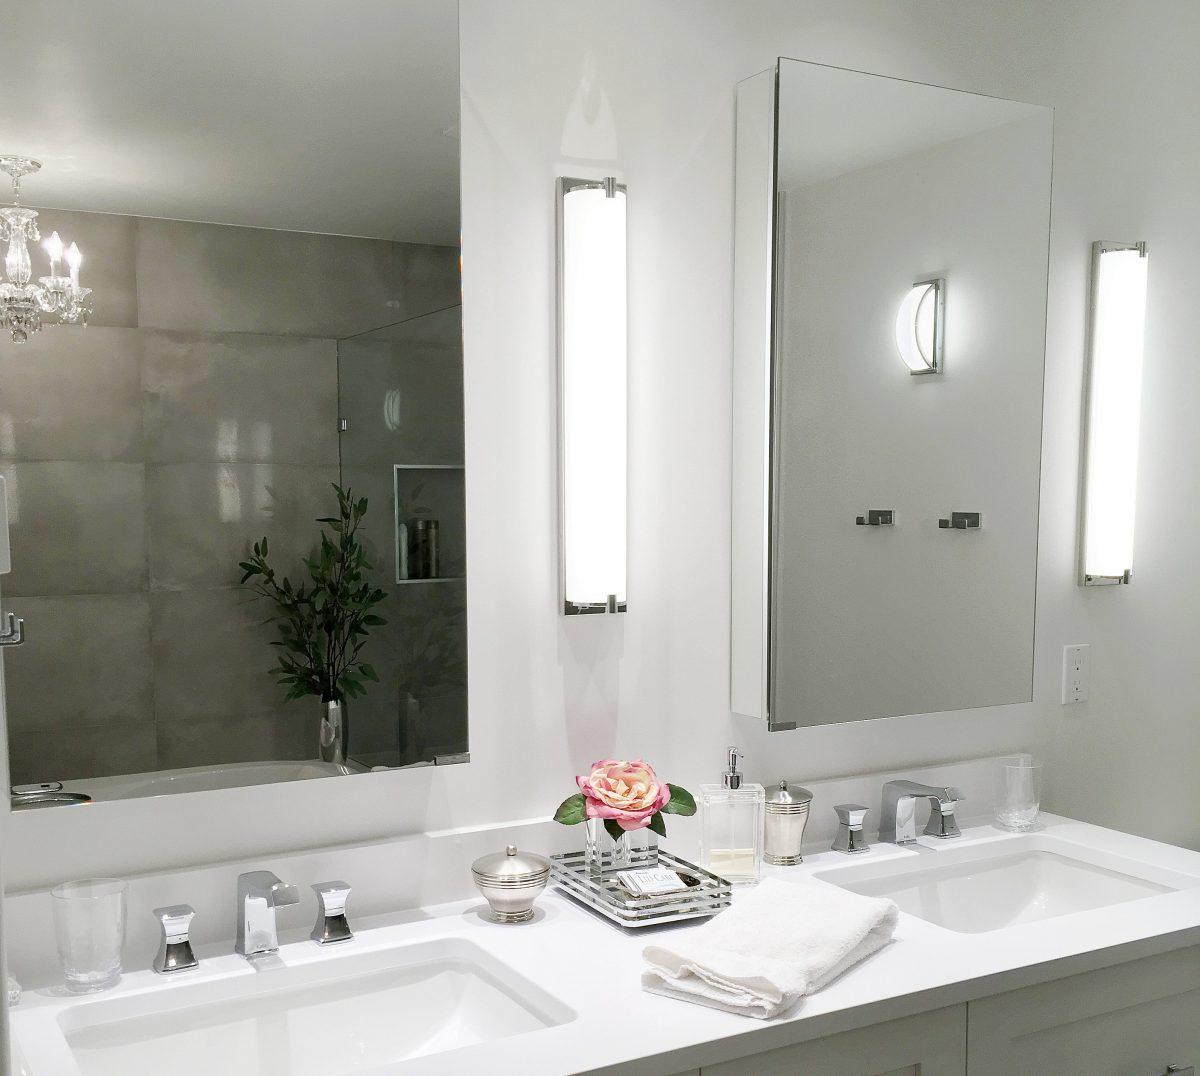 Norburn Lighting and Bath, ROOM TIPS